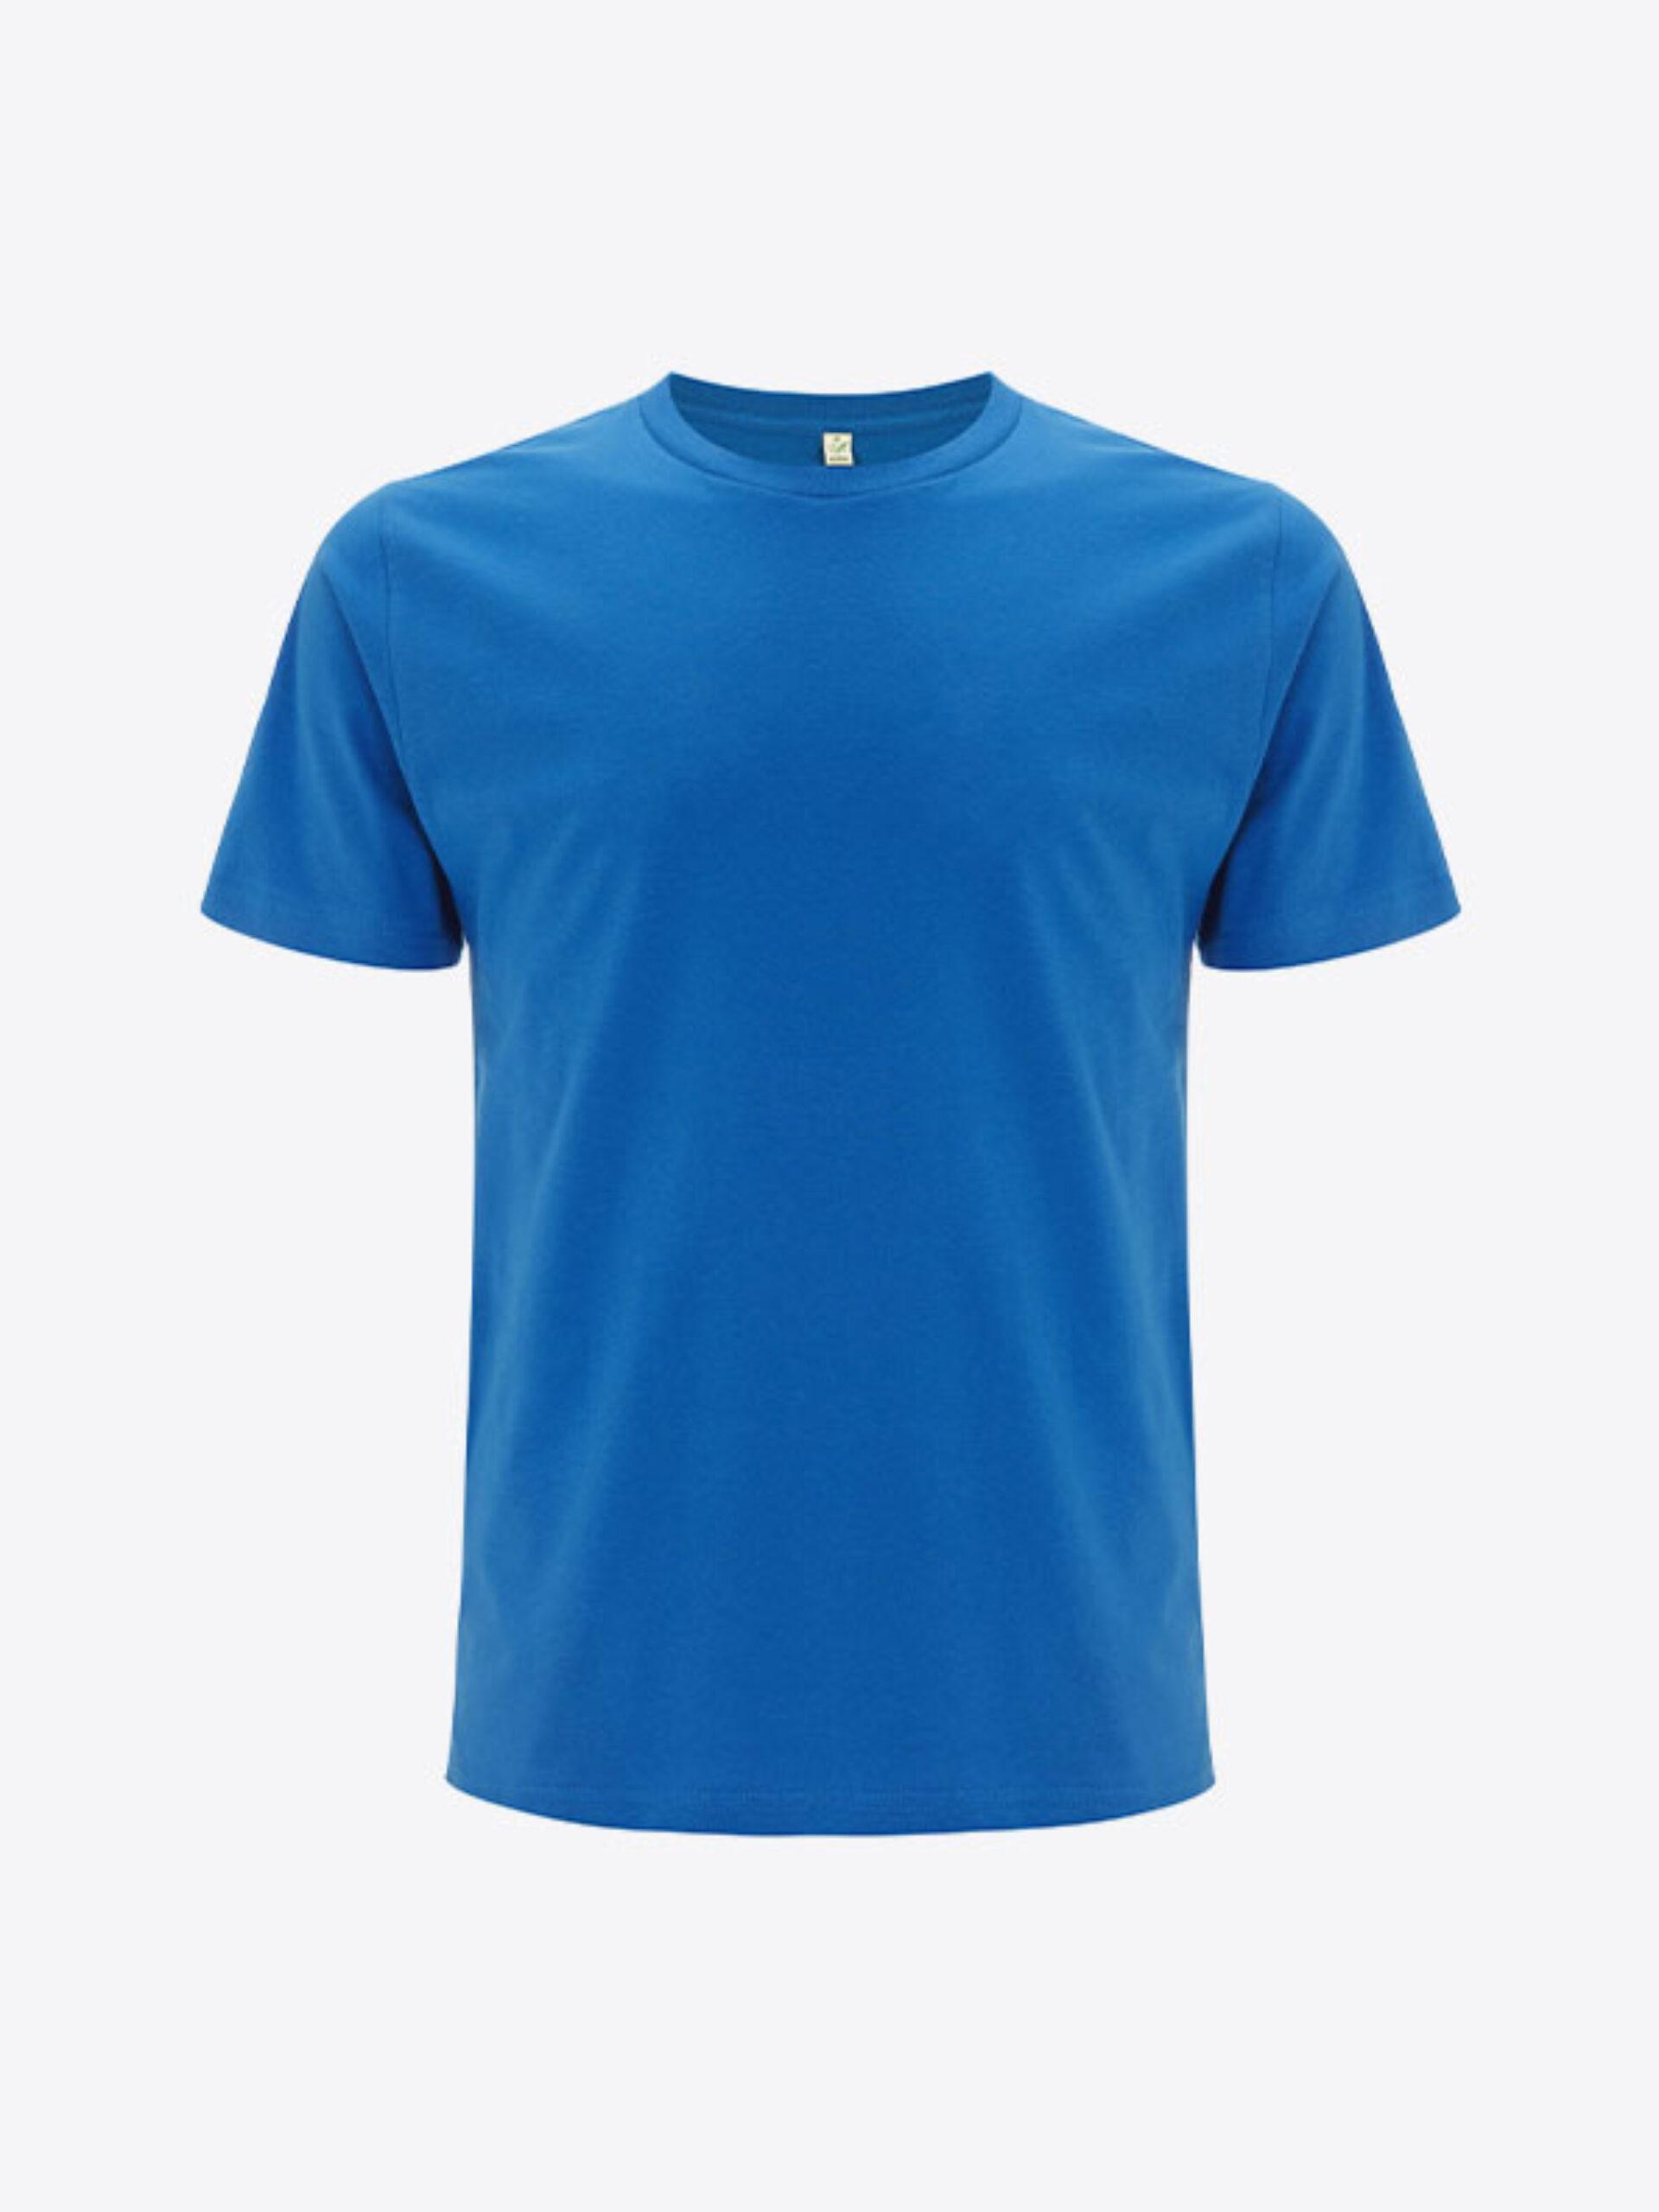 Herren T Shirt Earth Positive Ep01 Bright Blue